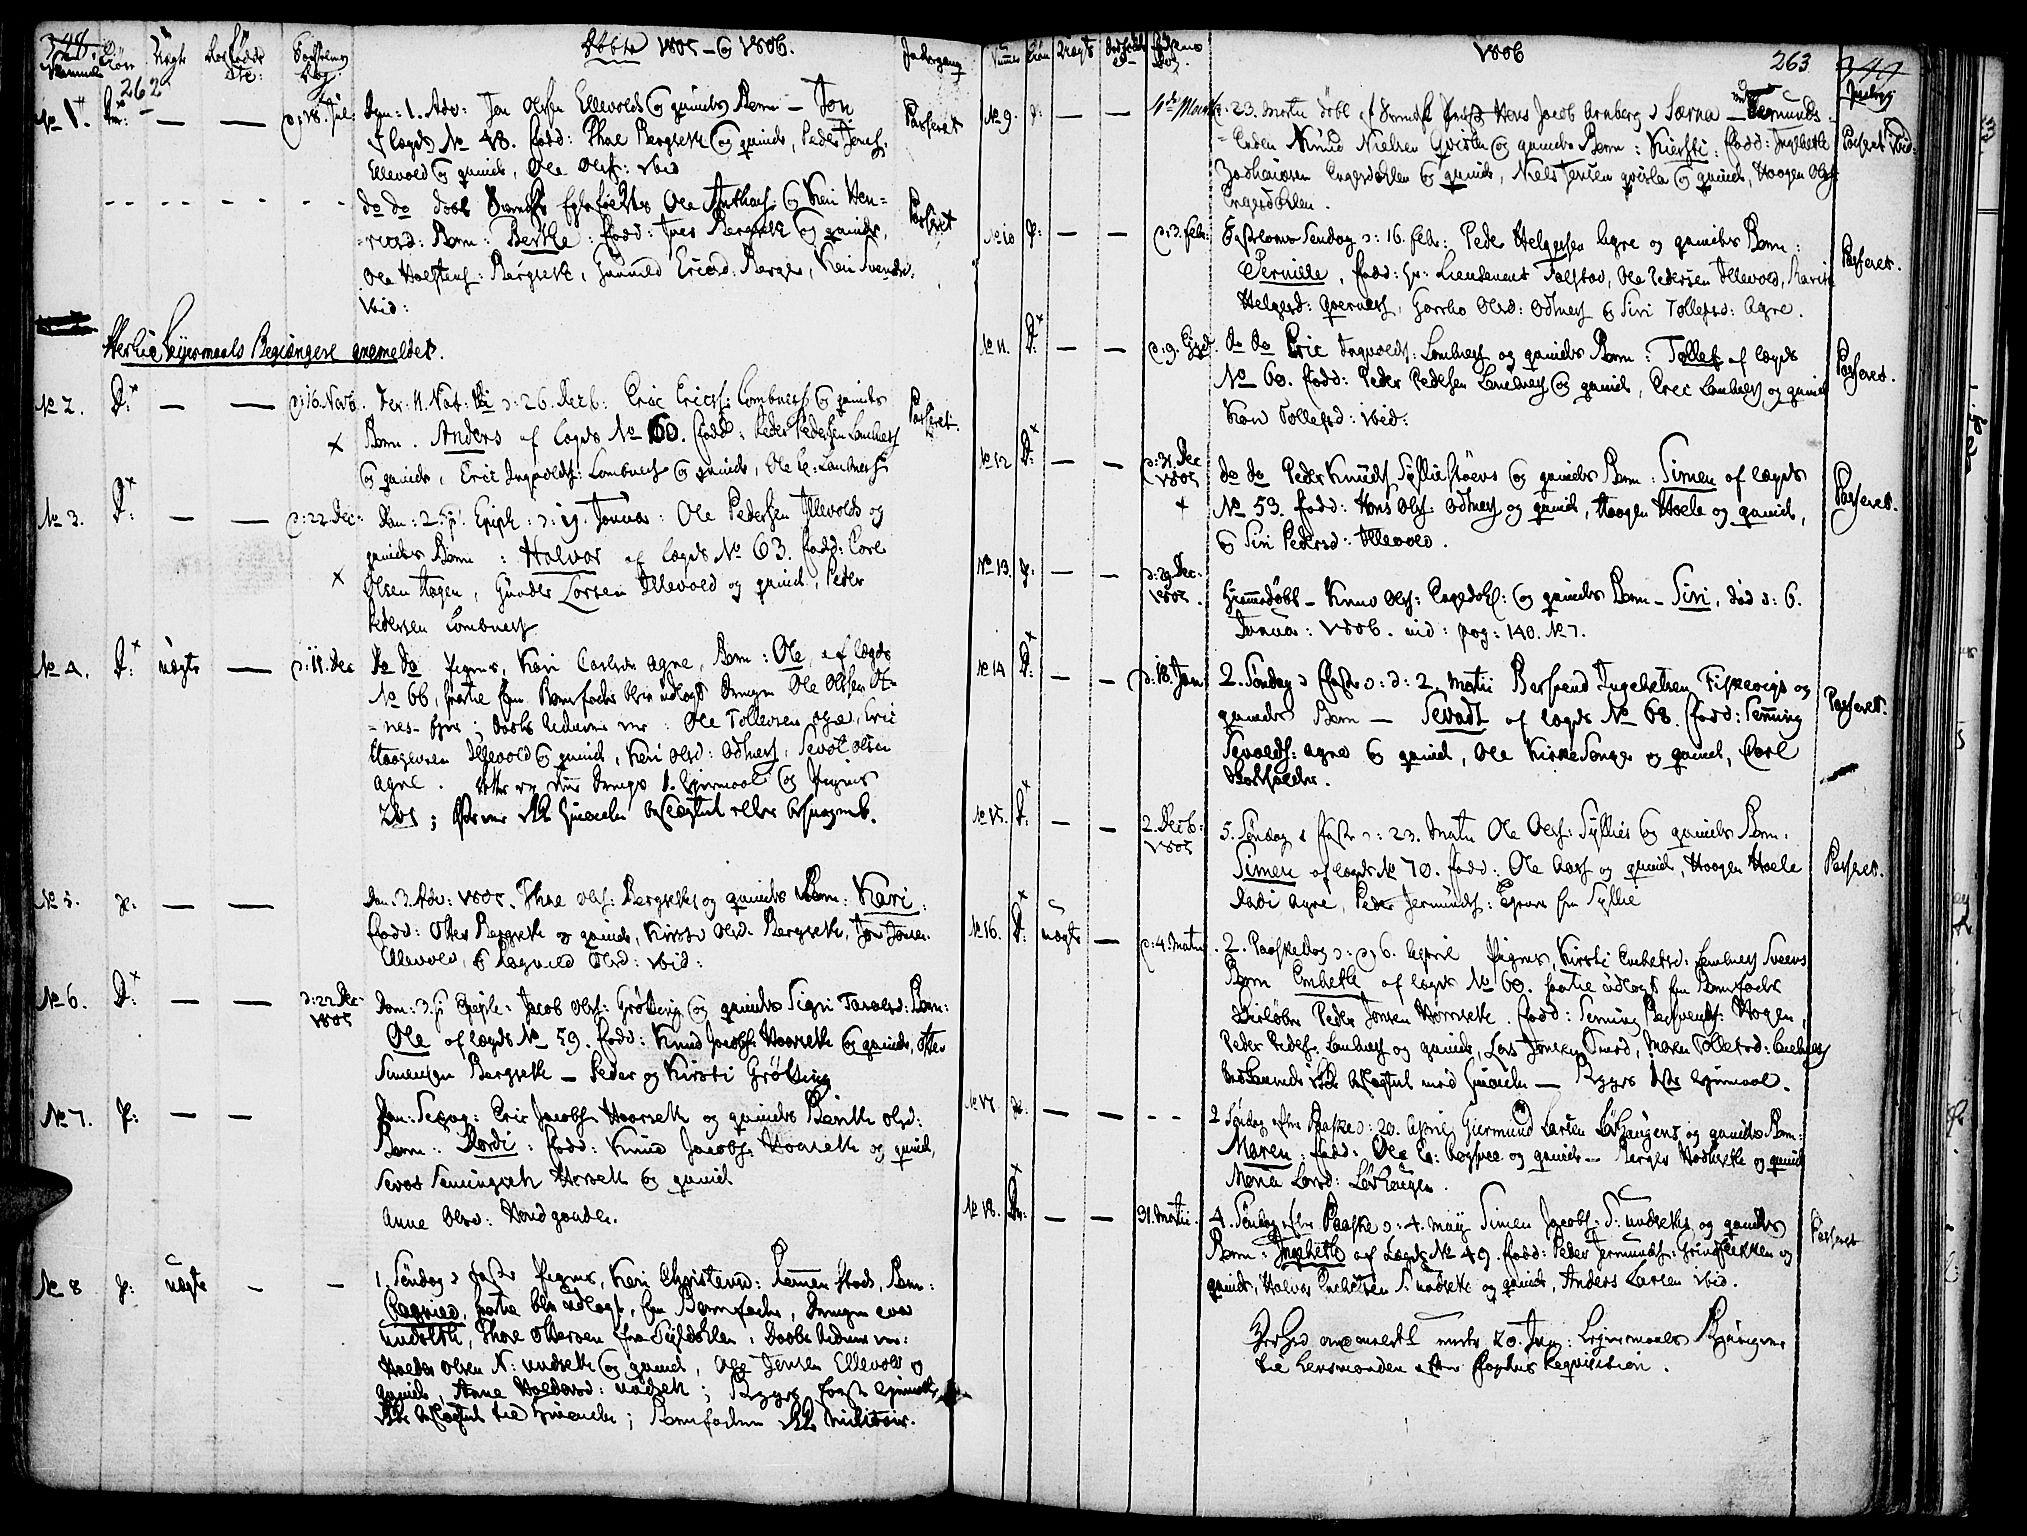 SAH, Rendalen prestekontor, H/Ha/Haa/L0002: Parish register (official) no. 2, 1788-1814, p. 262-263